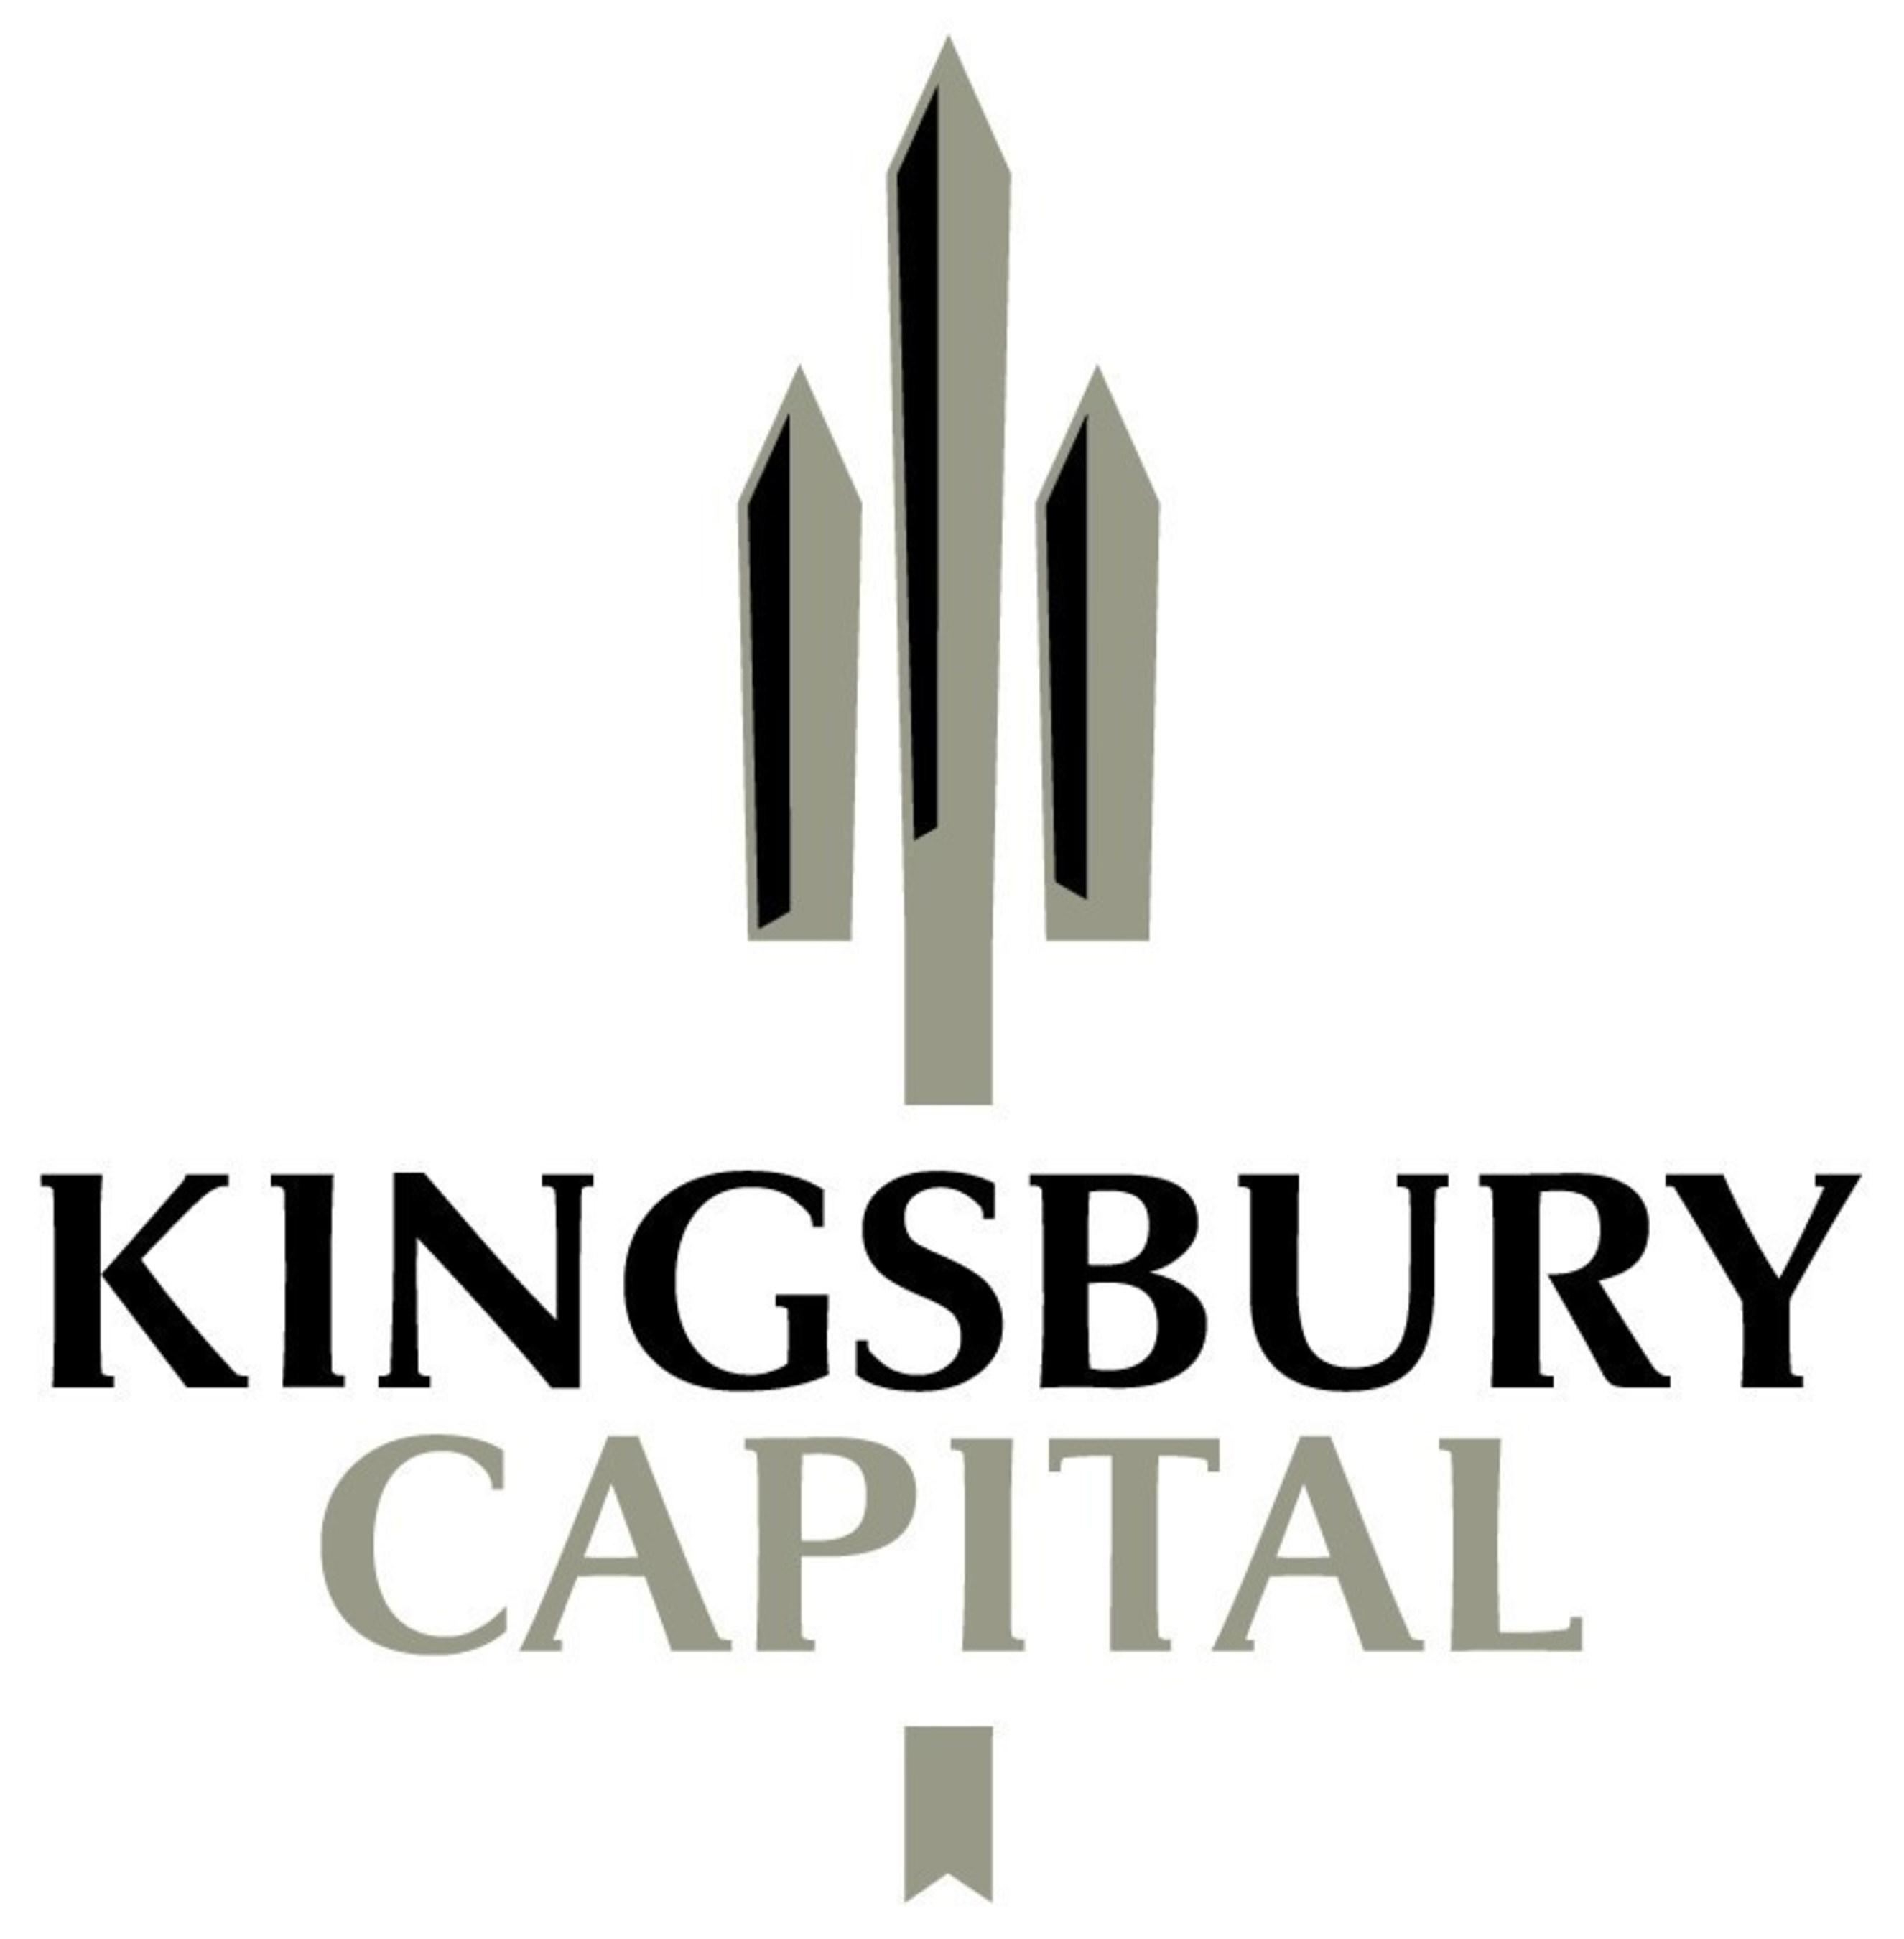 Kingsbury Capital